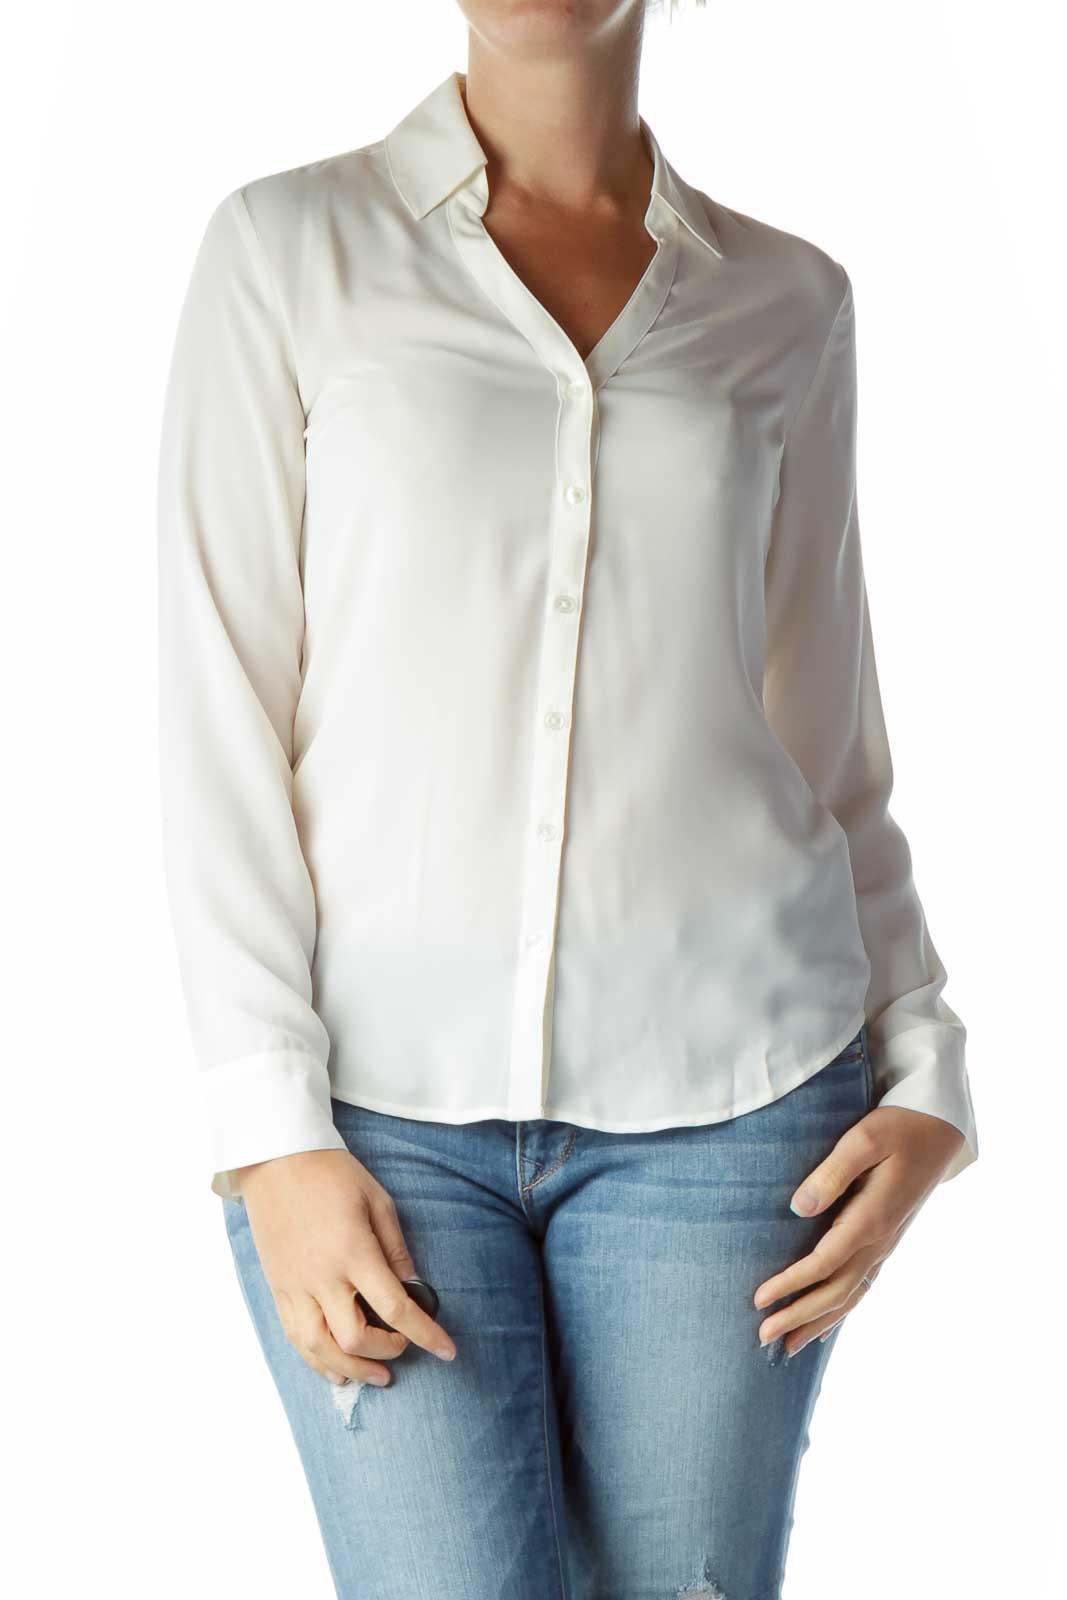 Cream Sheer Collared Shirt